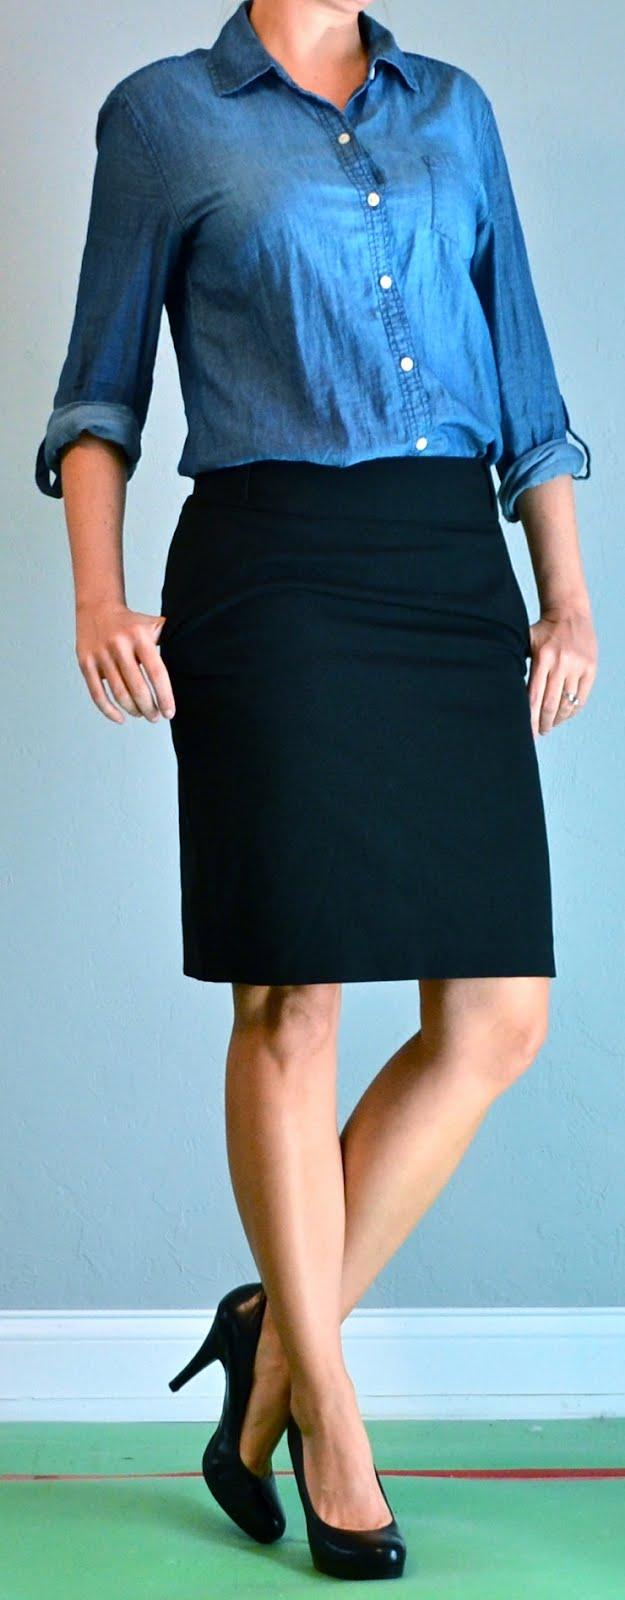 Pity, that pencil skirt heels